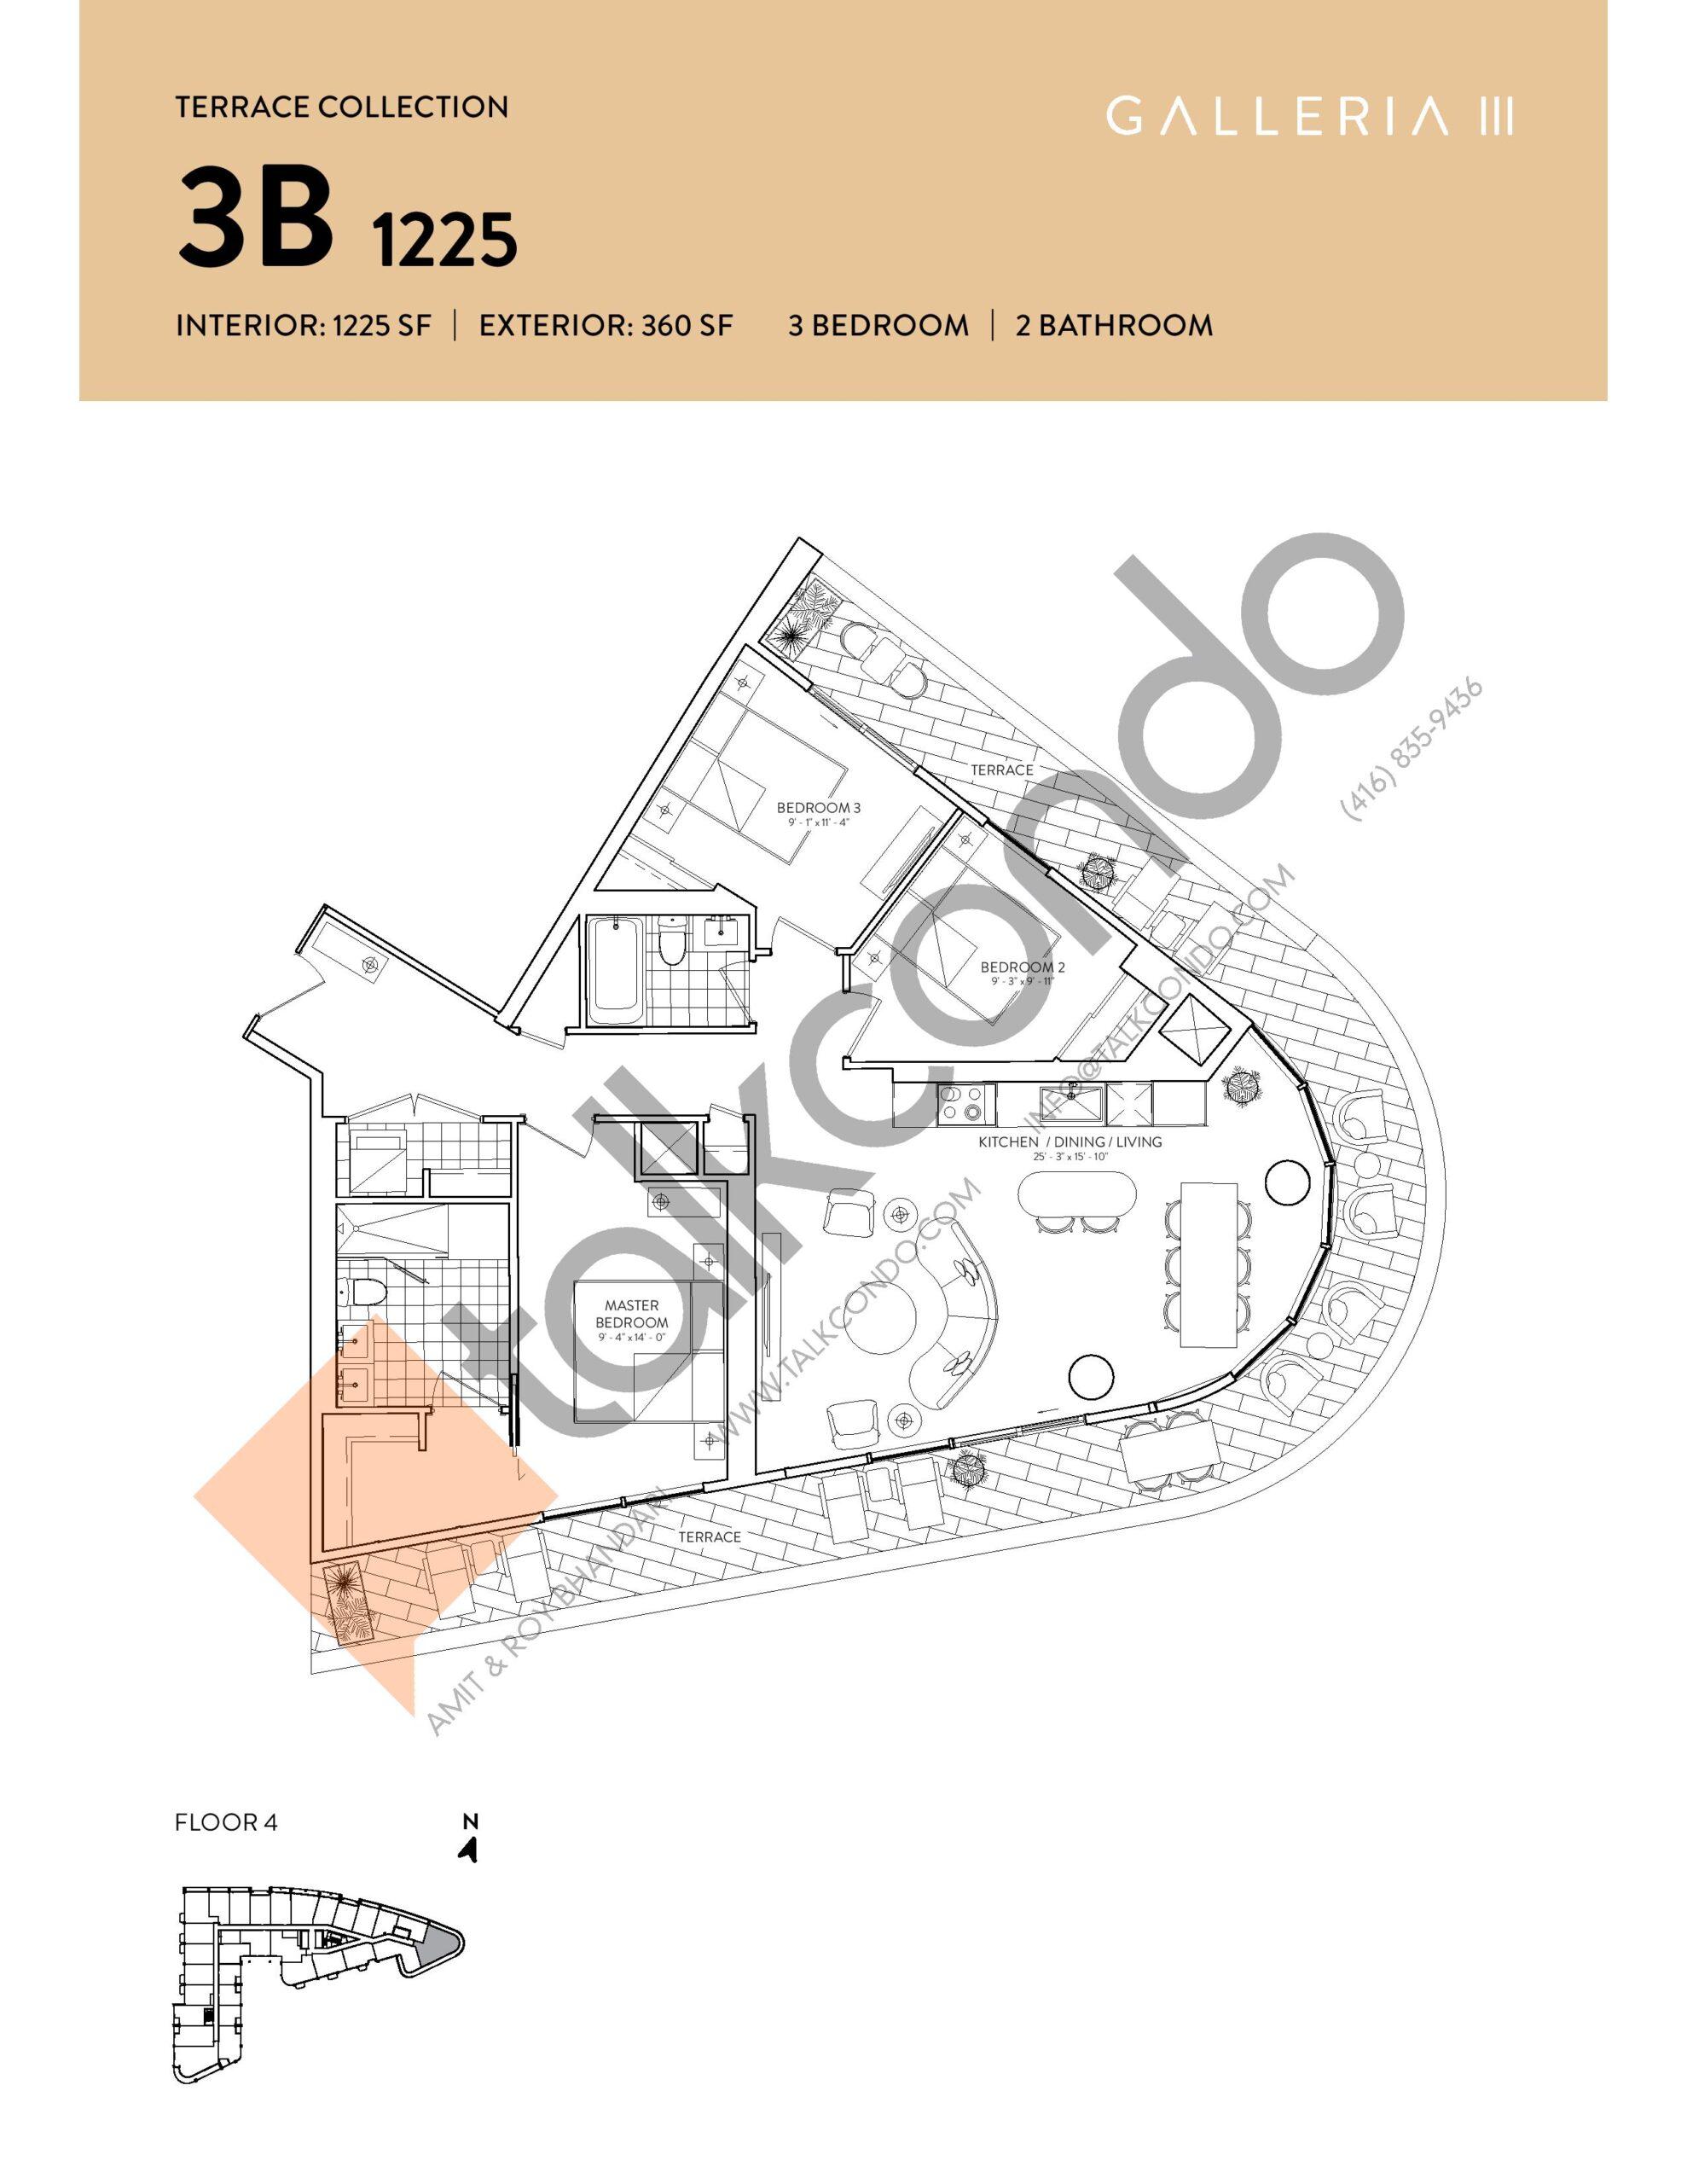 3B 1225 - Terrace Collection Floor Plan at Galleria 03 Condos - 1225 sq.ft